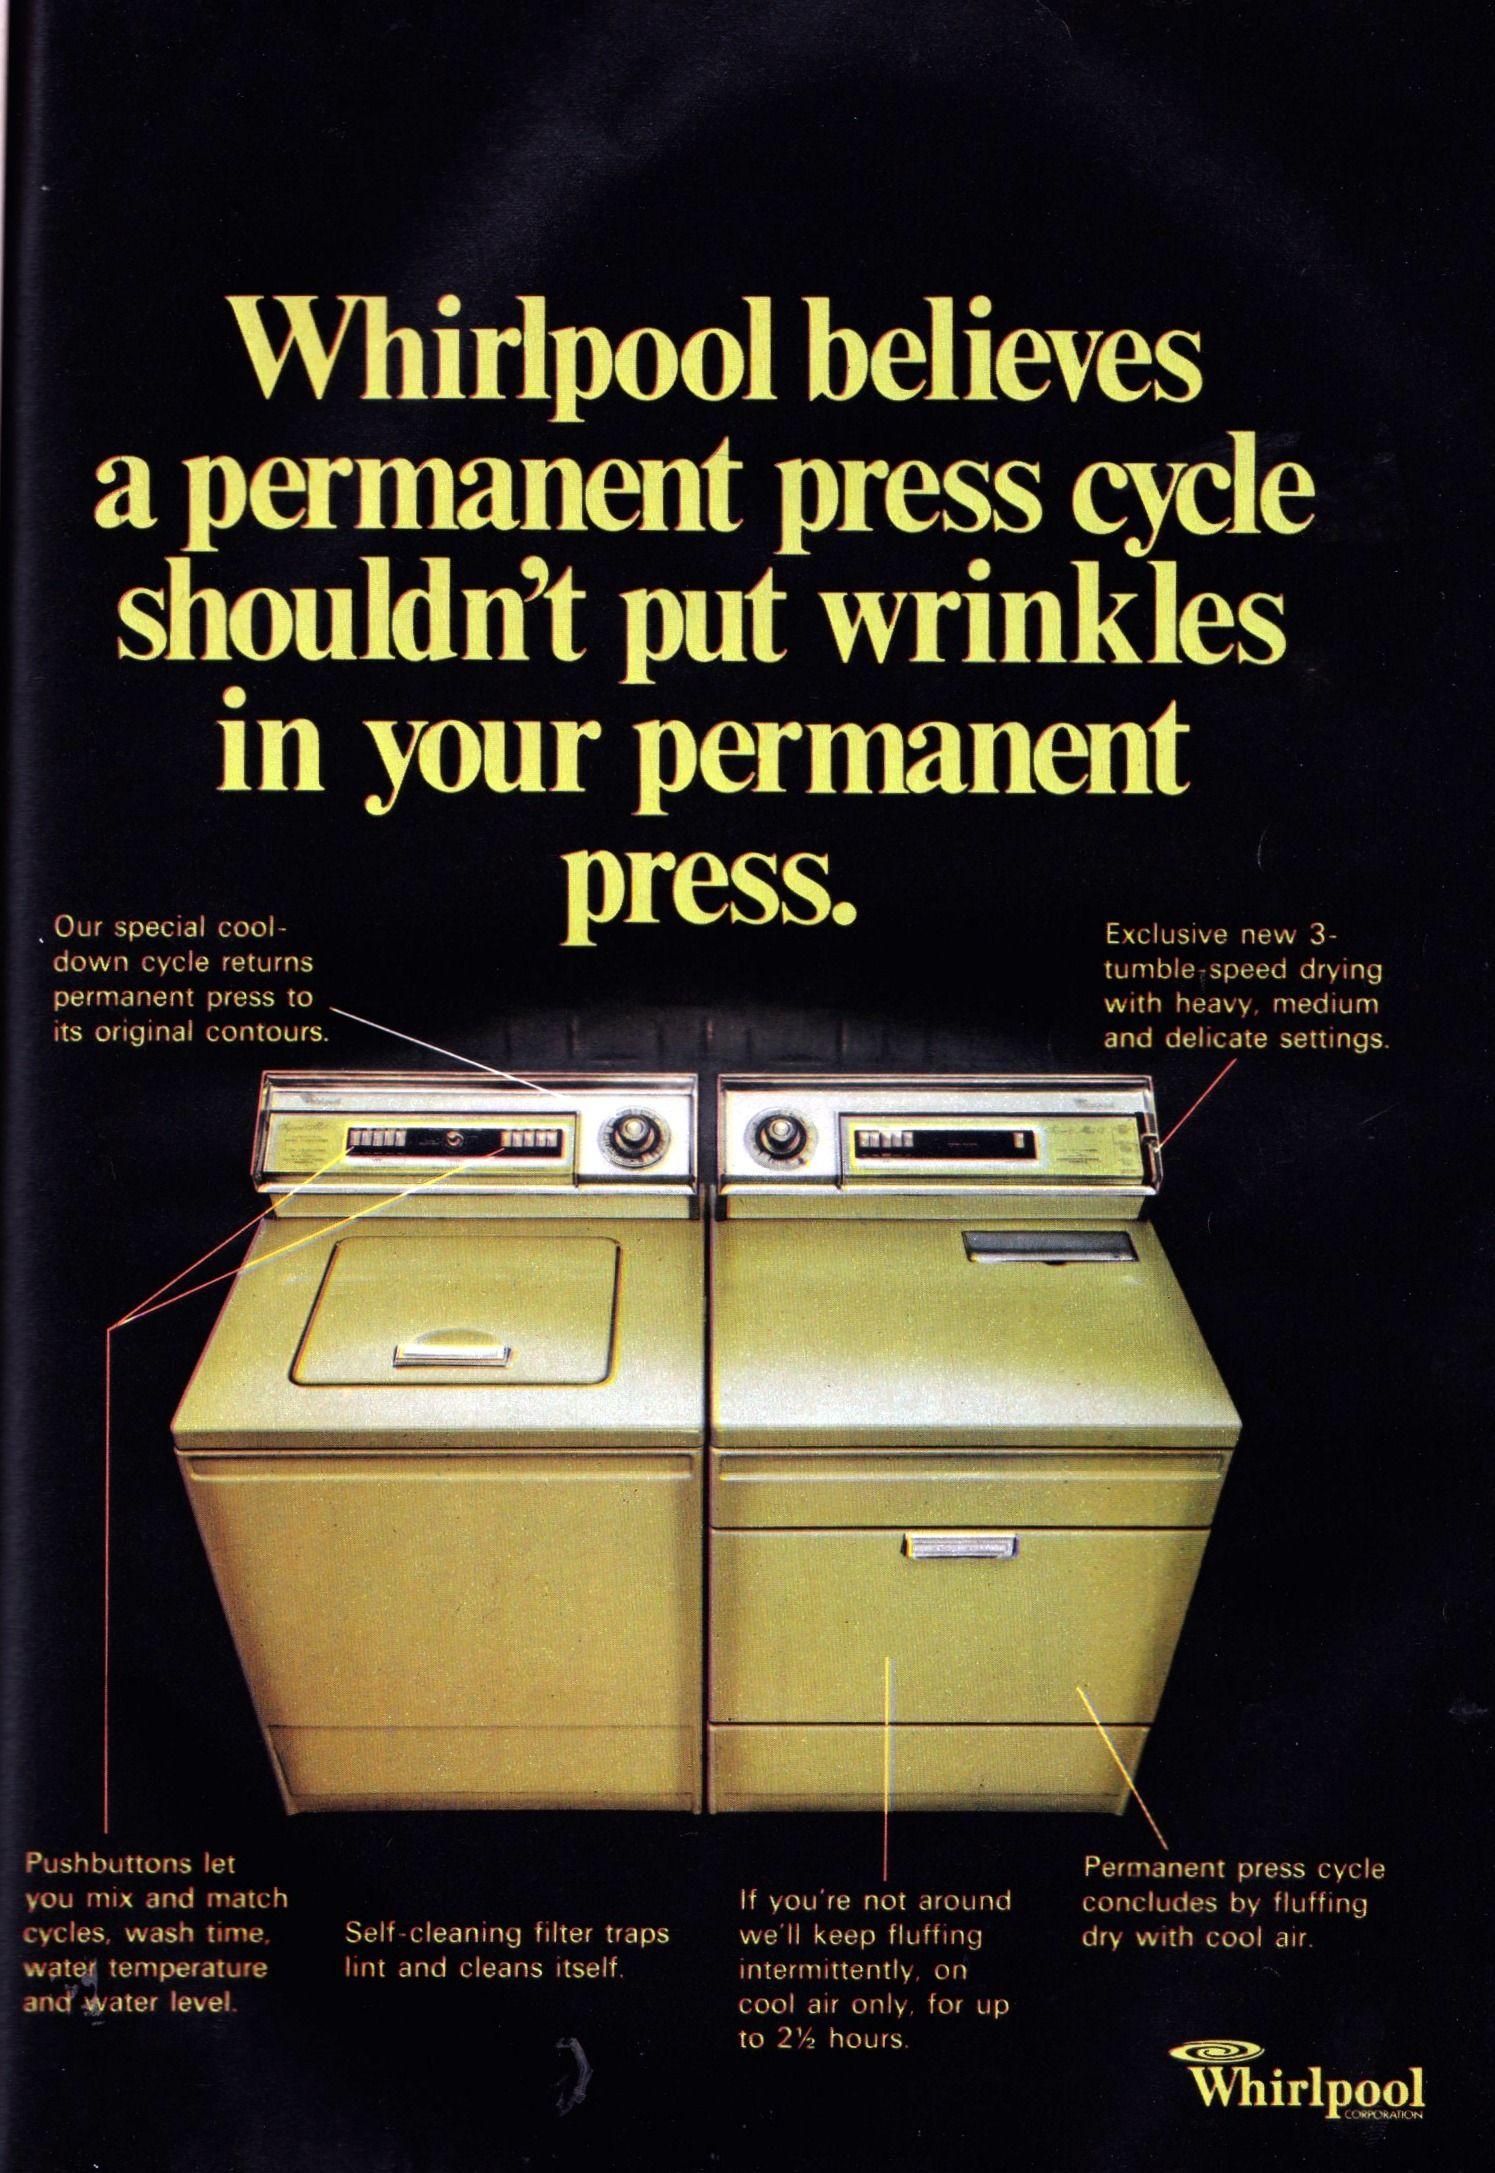 Whirlpool Washer and Dryer Vintage washing machine